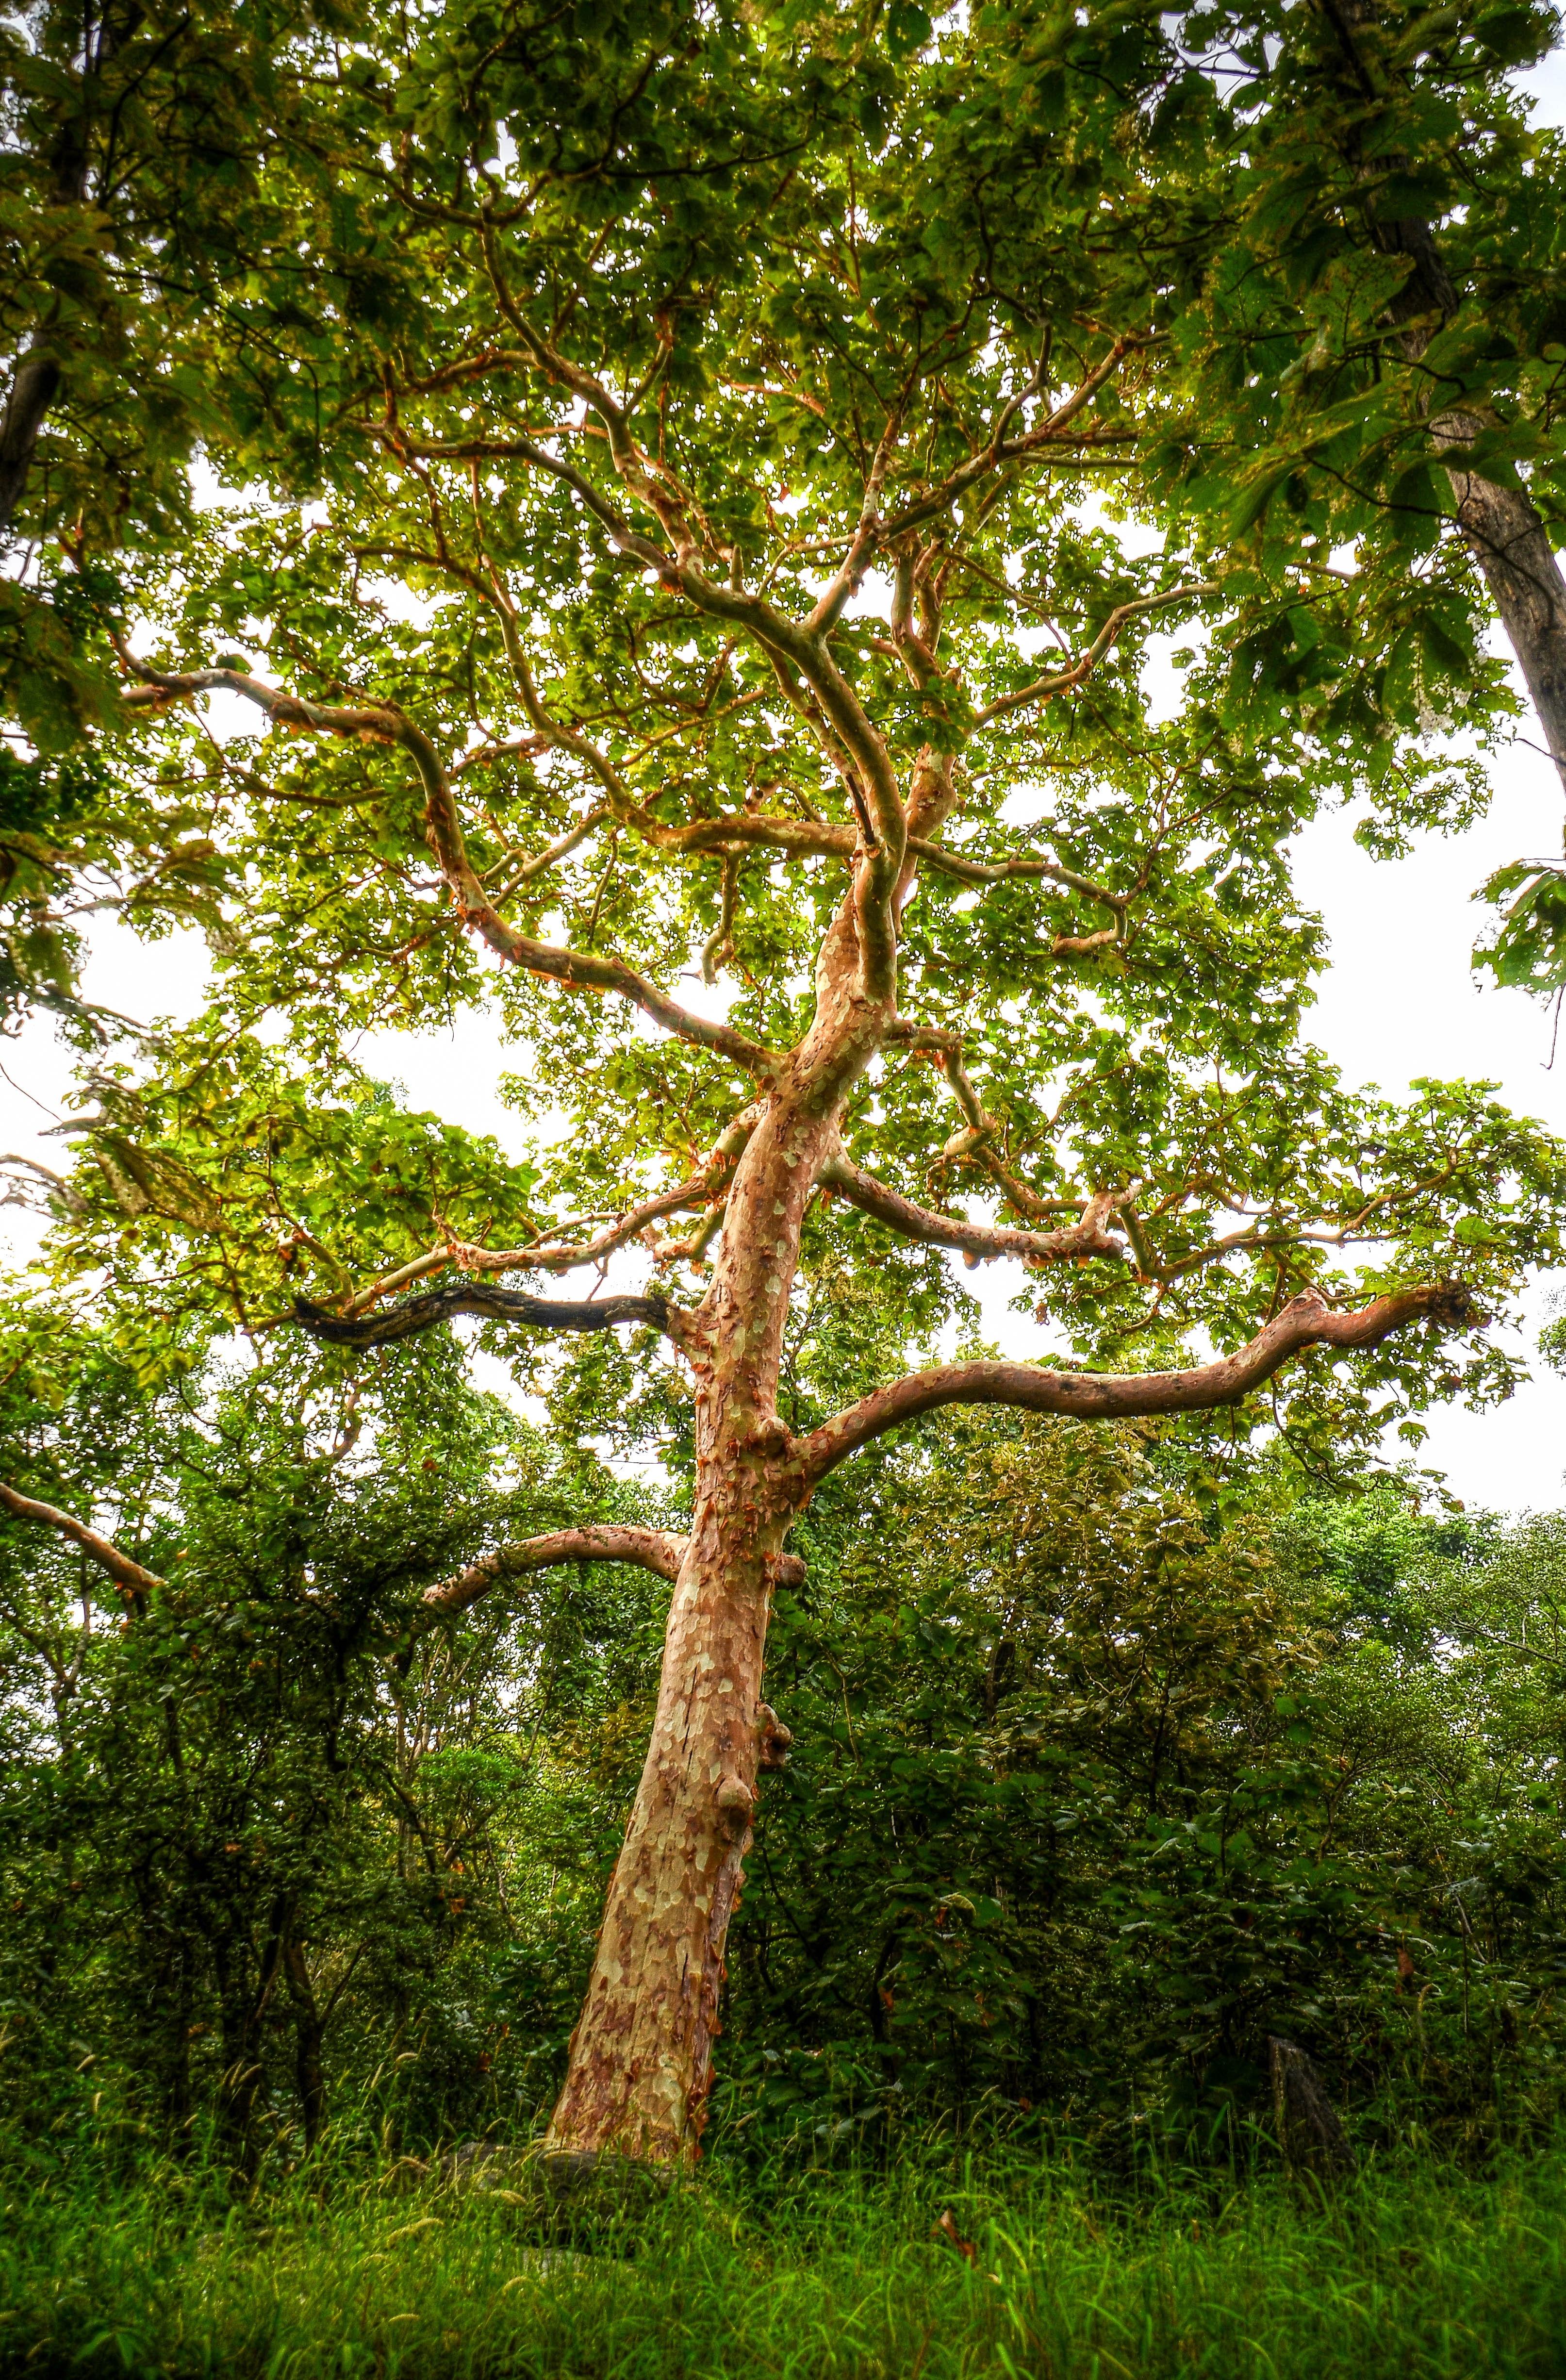 Green Tall Tree, Bark, Nature, Trees, Tree trunk, HQ Photo